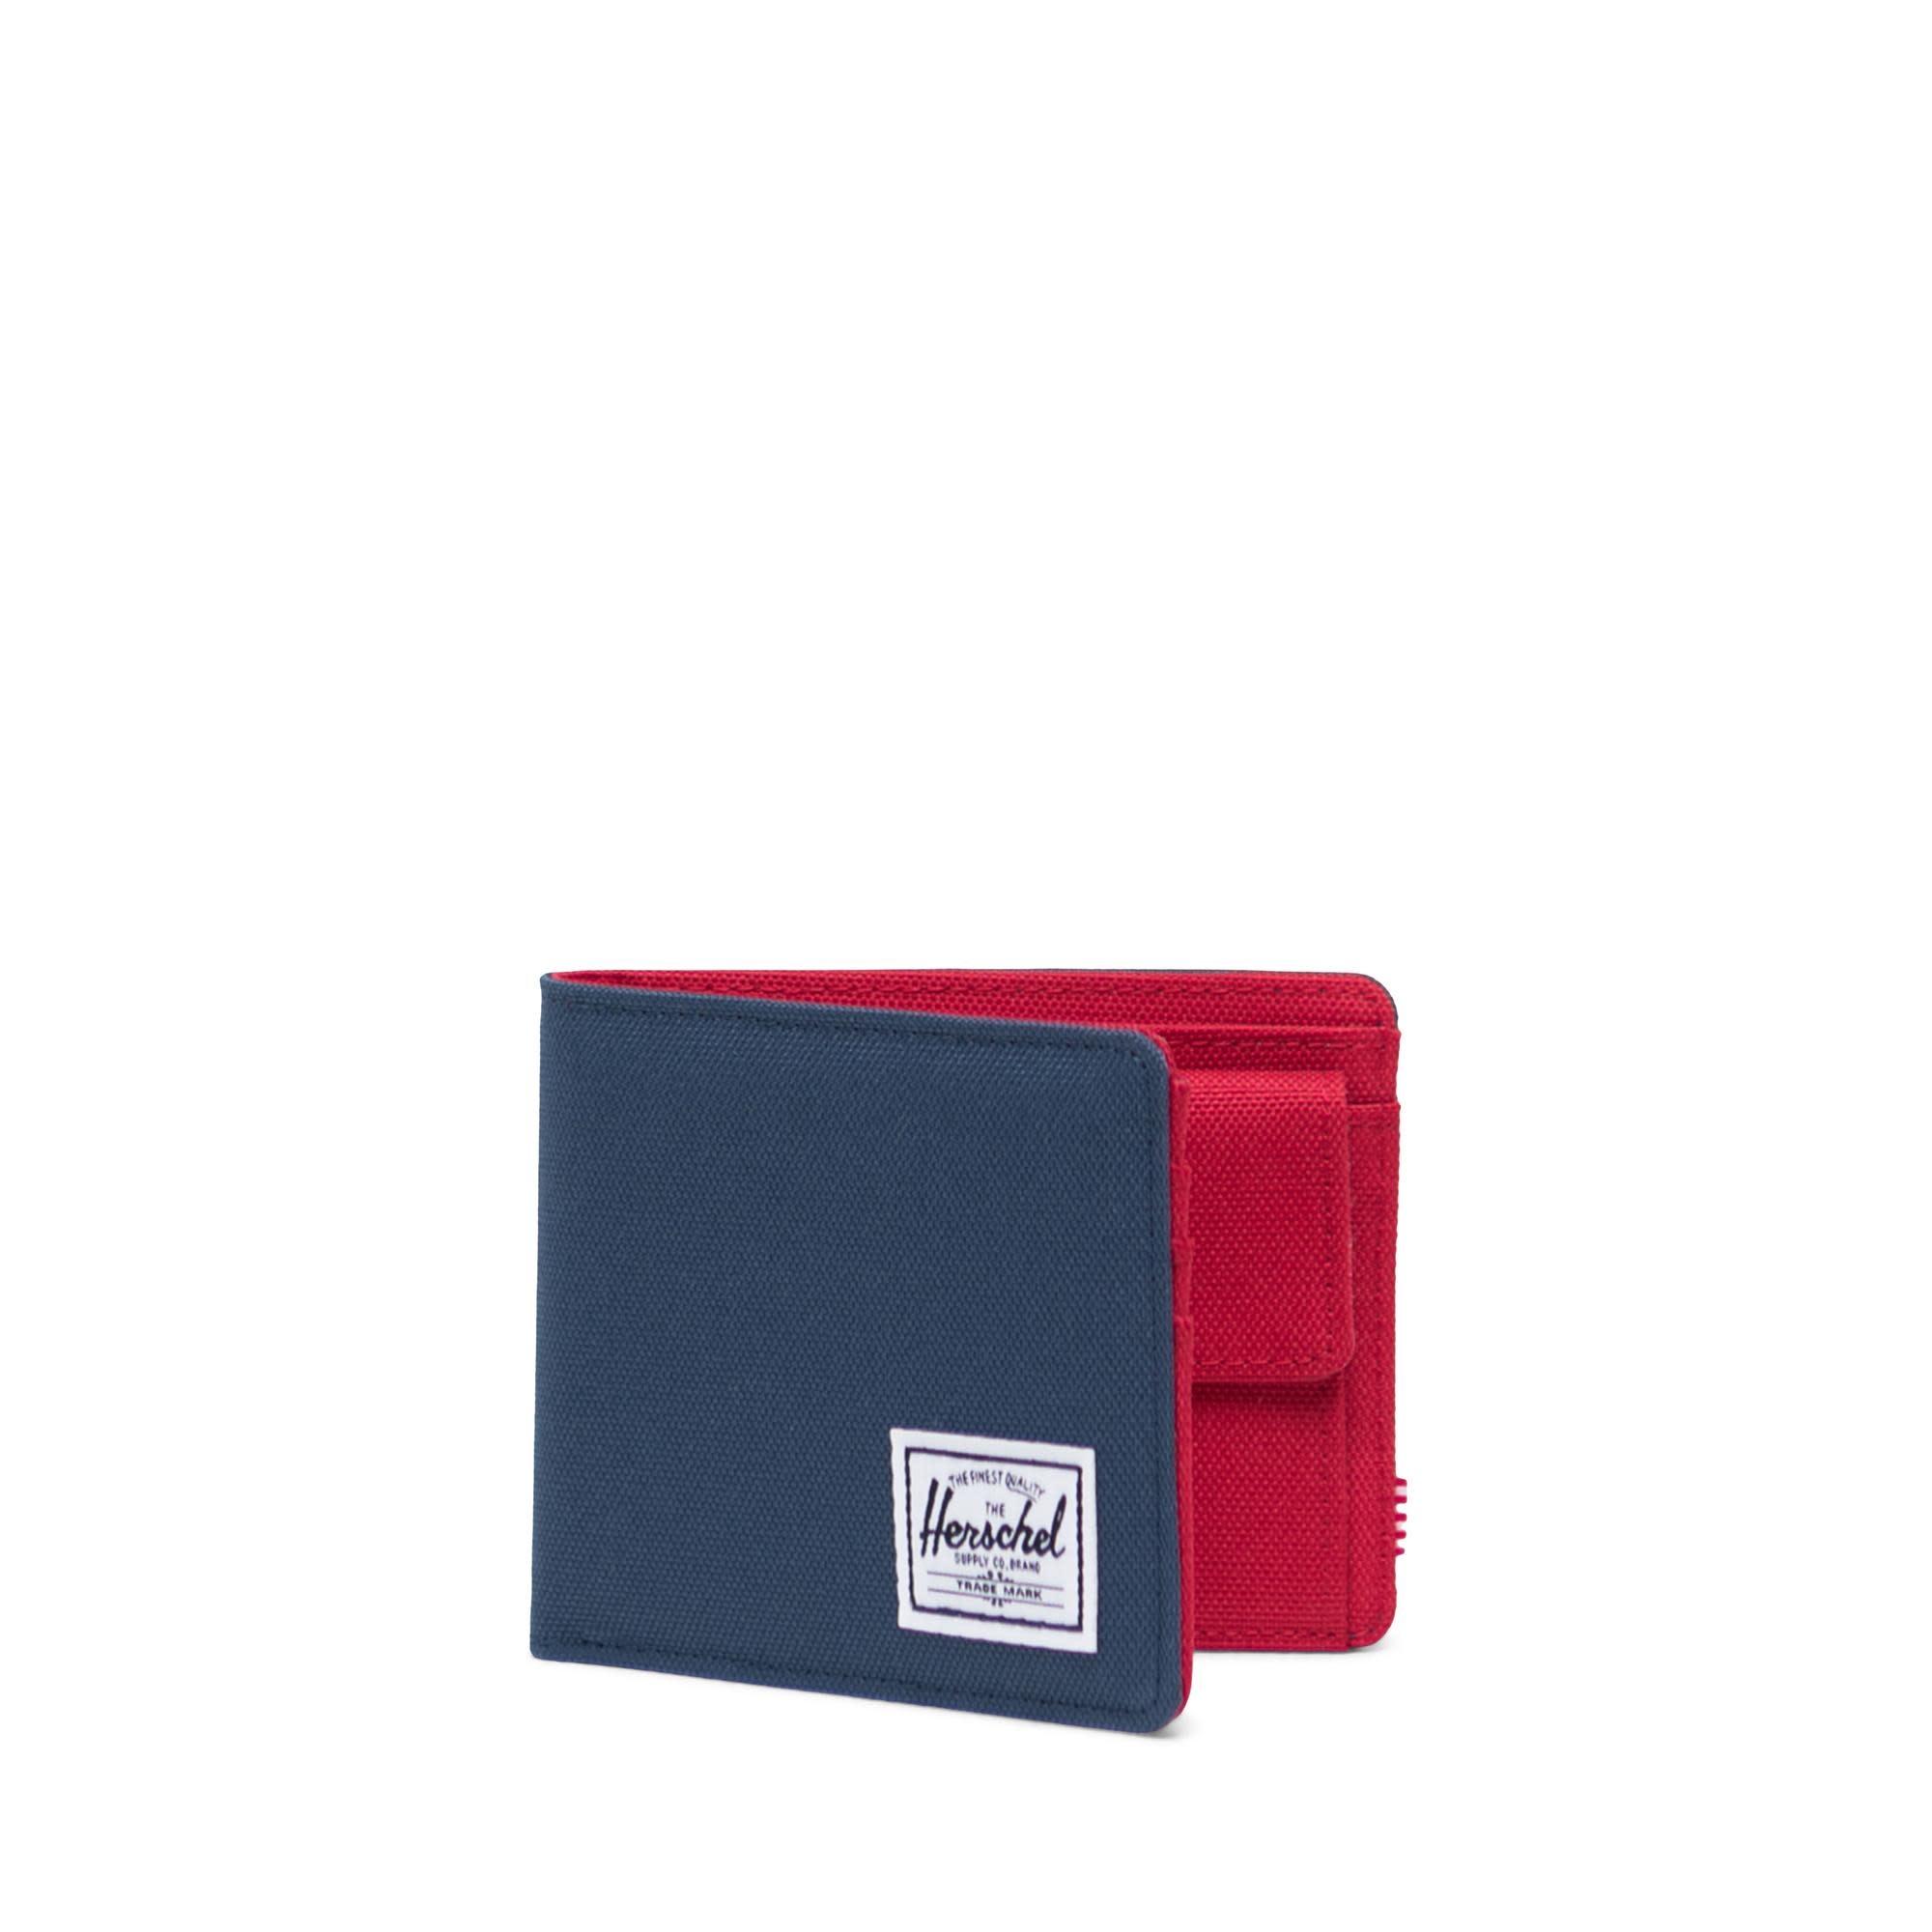 Herschel Supply Co. Herschel Roy Coin Wallet - Navy/Red